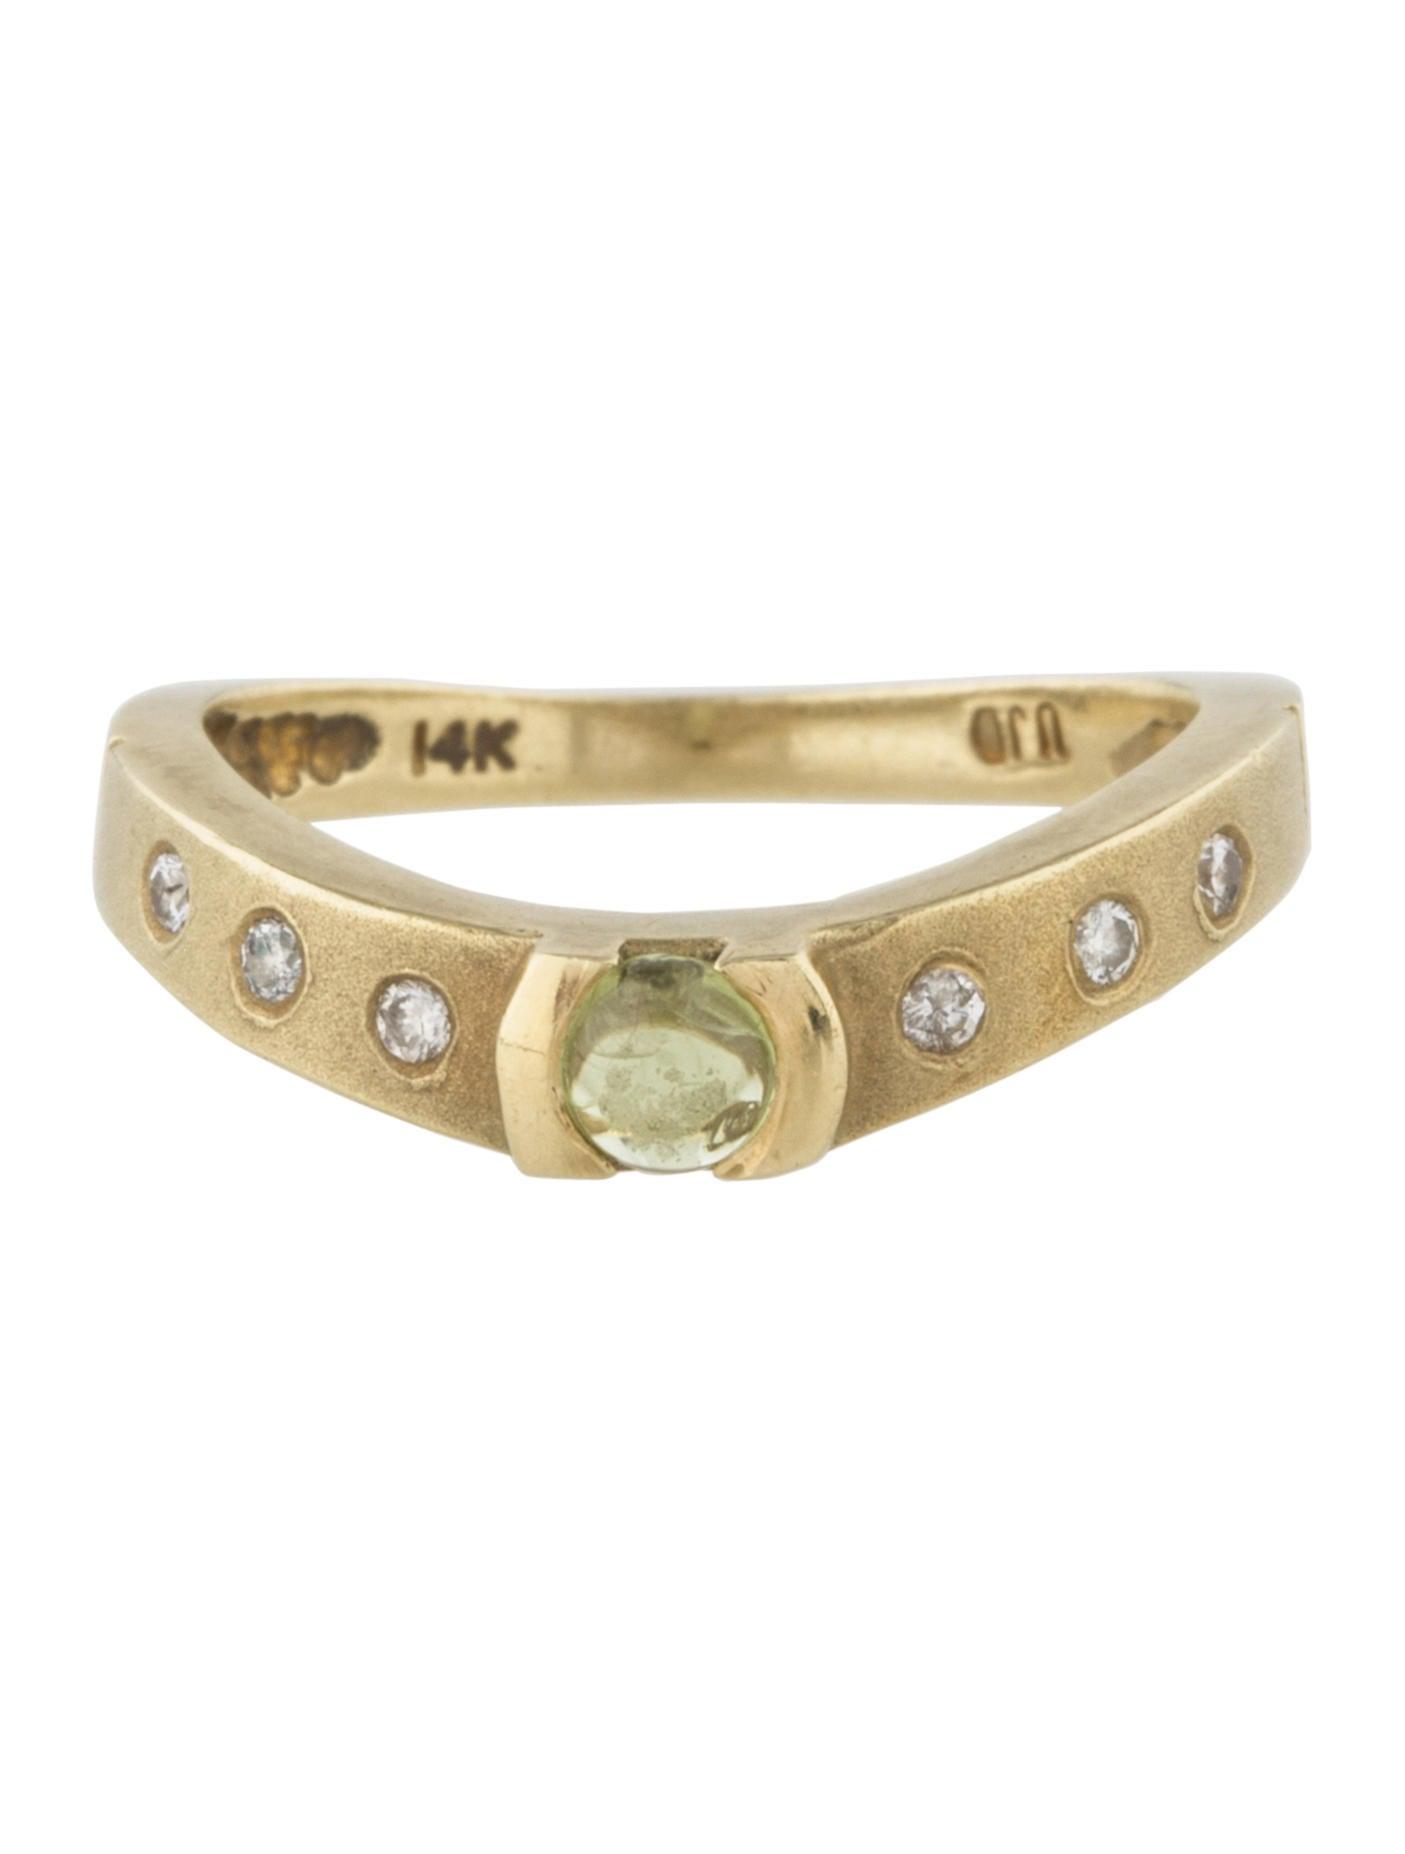 14k Peridot & Diamond Contour Ring  Rings  Rring38318. Beautiful Men Wedding Wedding Rings. Bronze Coin Rings. Up Close And Stylish Wedding Rings. Wire Rings. Solid Silver Rings. Amber Diamond Wedding Rings. Ranka Engagement Rings. Indigo Rings